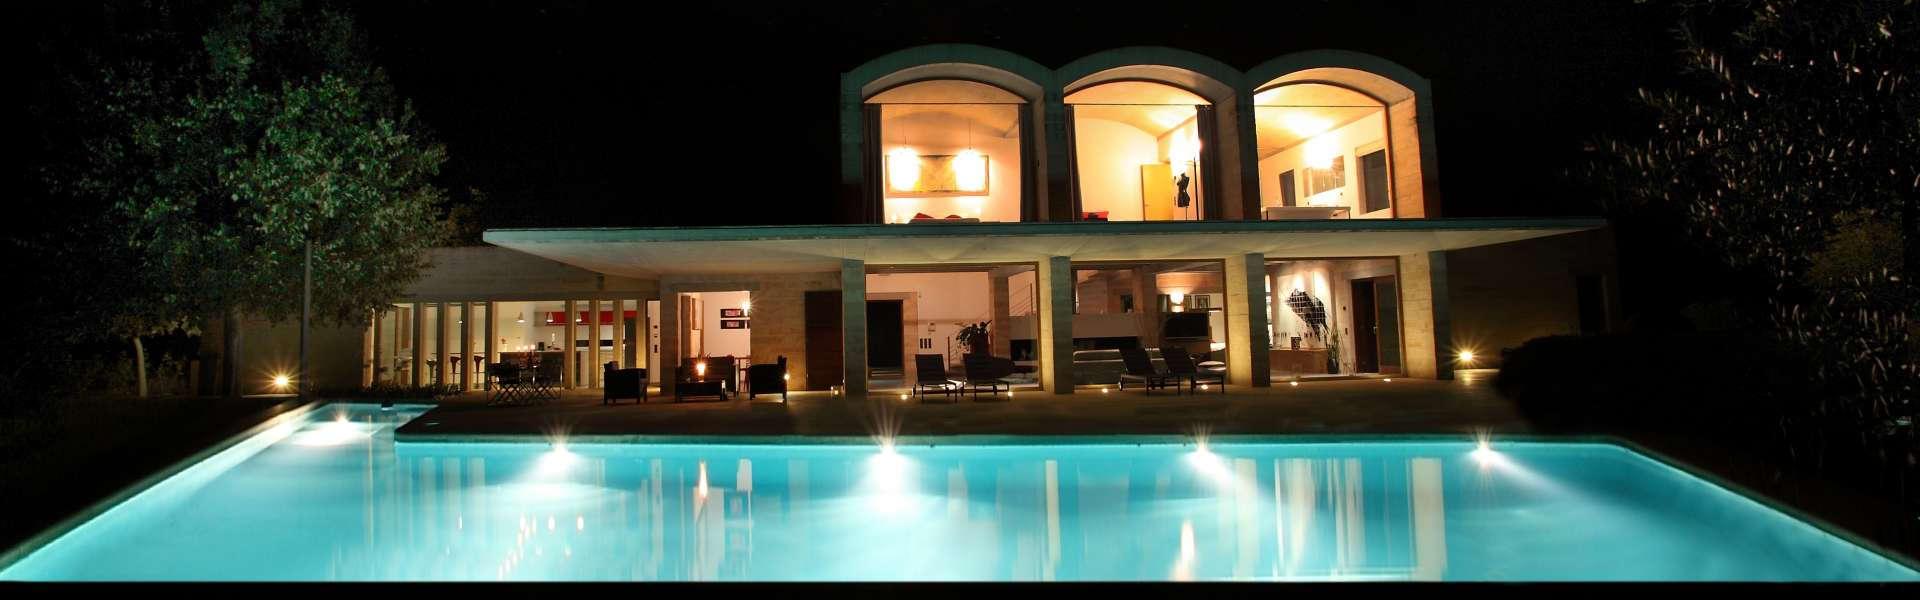 Montemar Immobilien Mallorca - Villa mit Pool